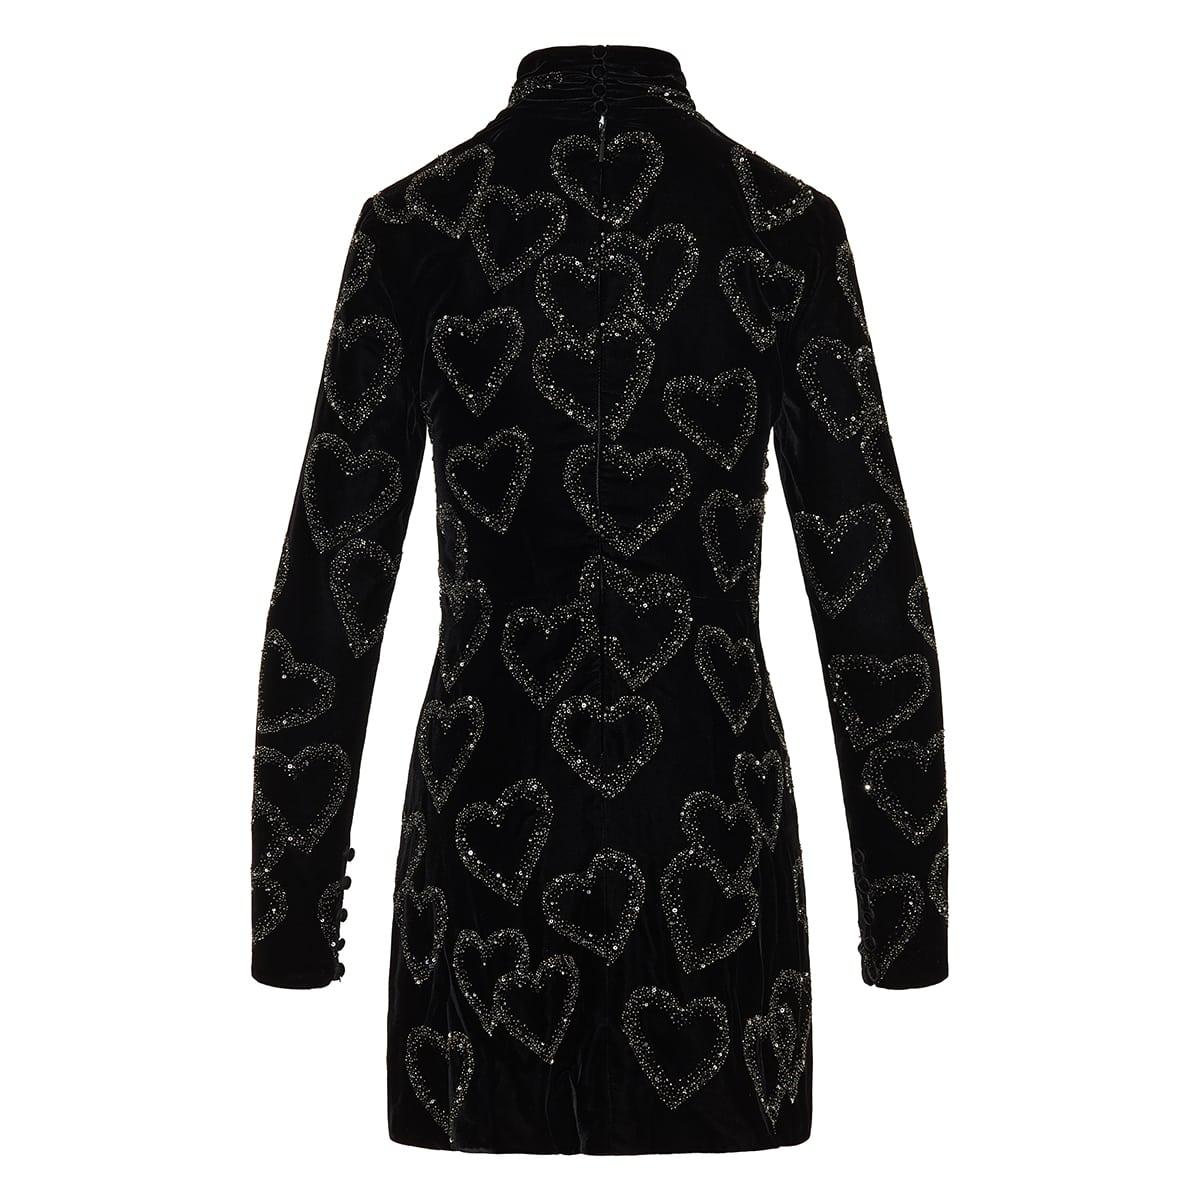 Hearts embellished mini dress